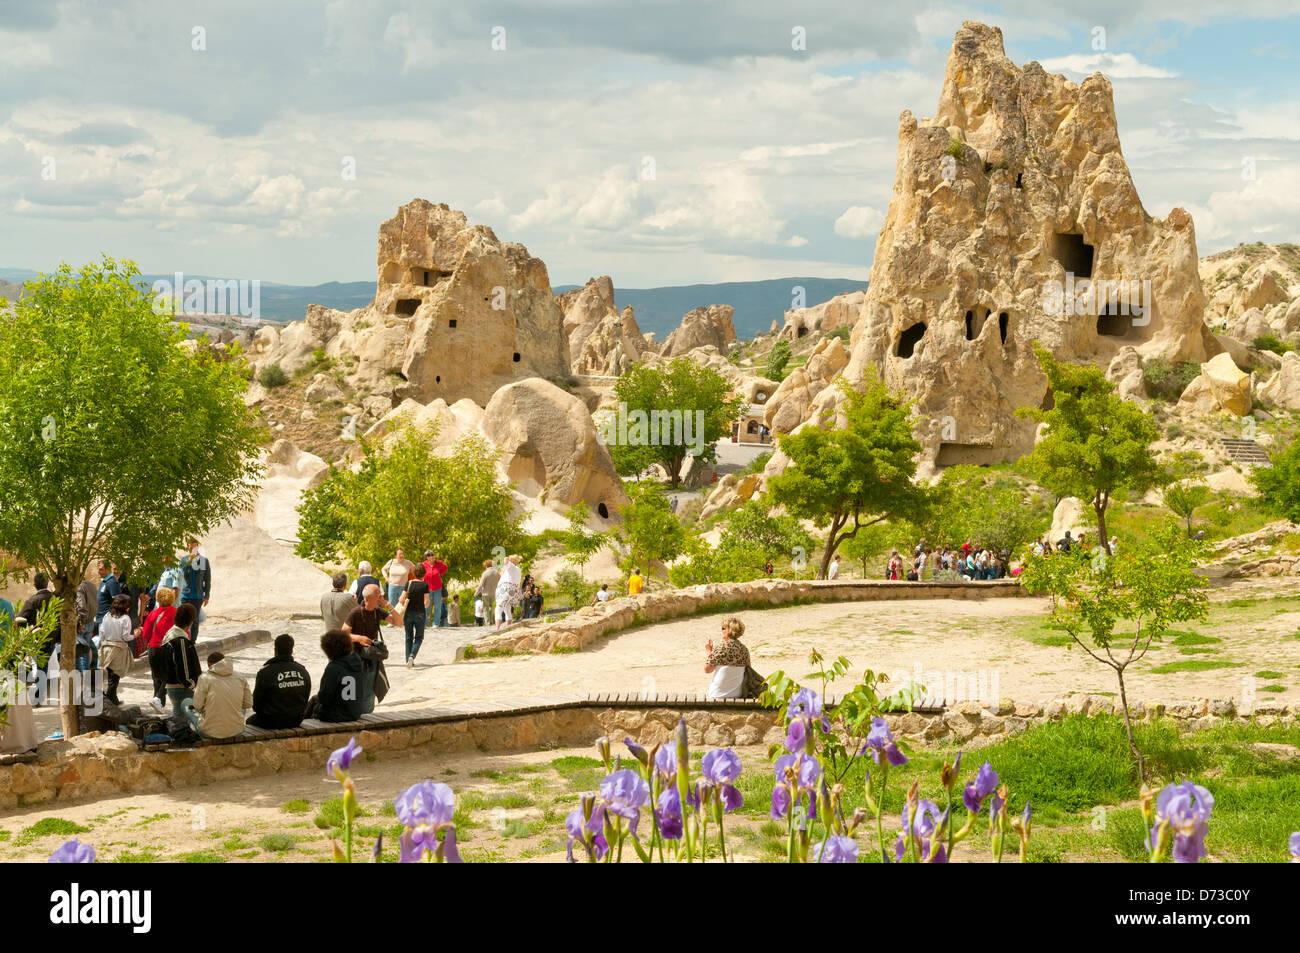 Open Air Museum, Goreme, Cappodocia, Nevsehir, Turkey - Stock Image